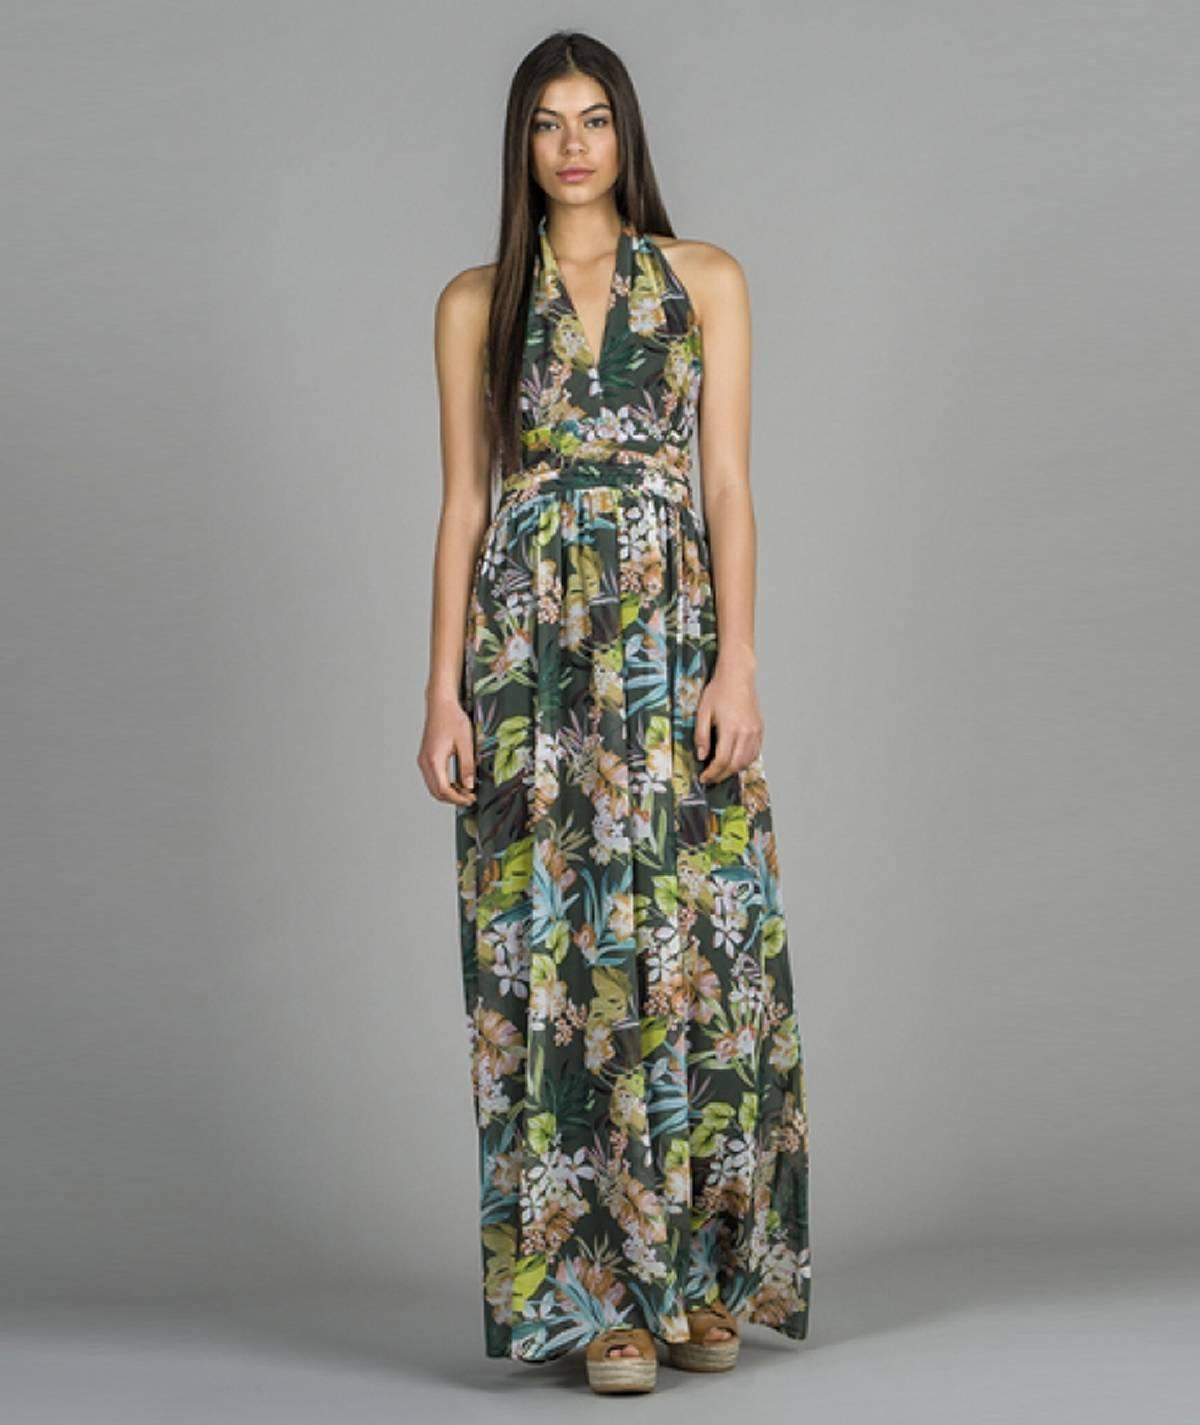 Vestido motivo florido